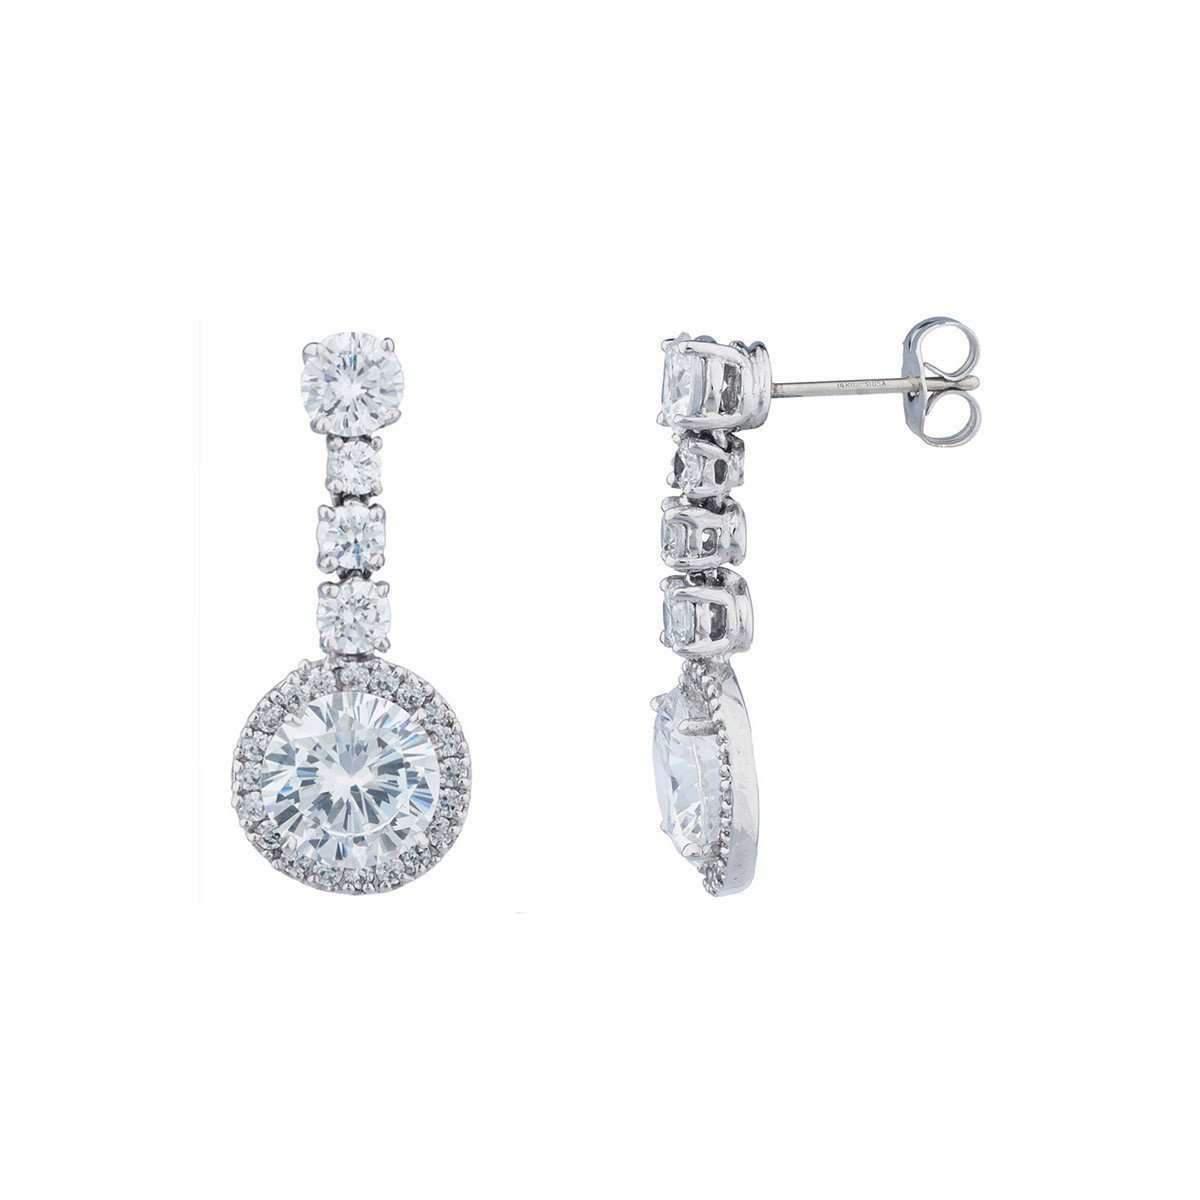 Fantasia Sterling Silver & Palladium Antique Drop Earrings FhuJk3